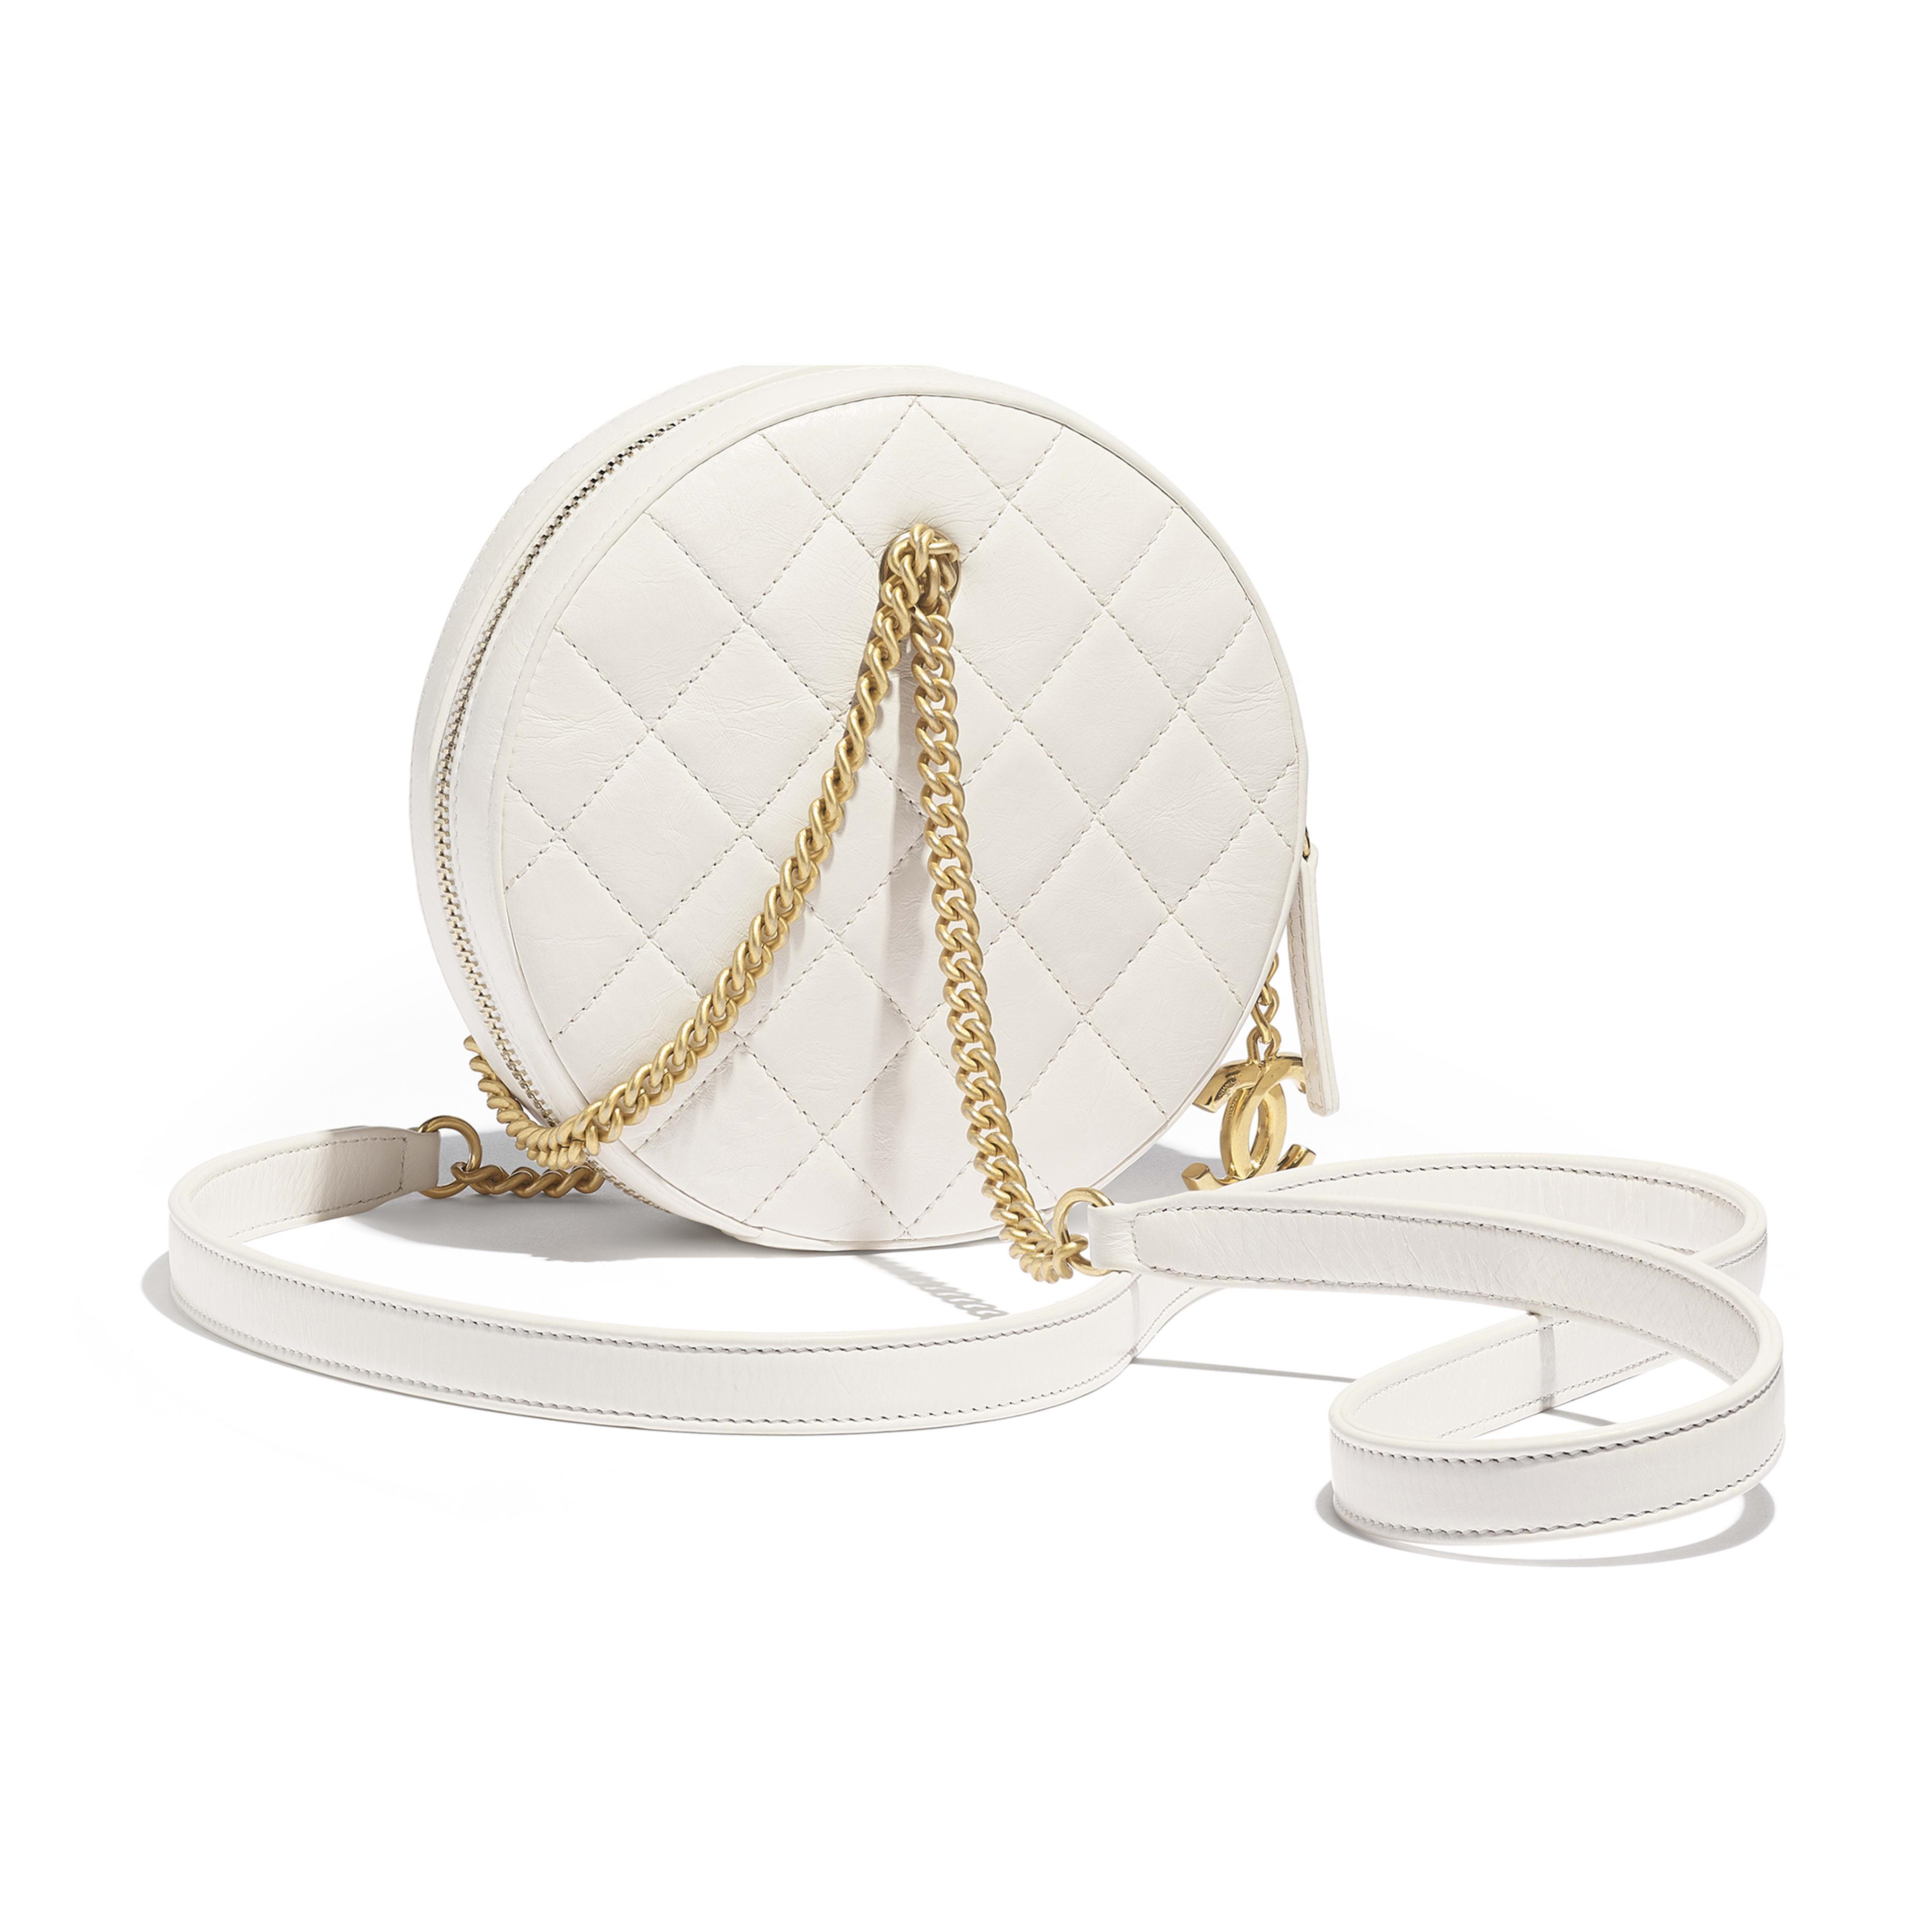 Small Round Bag - White - Crumpled Calfskin